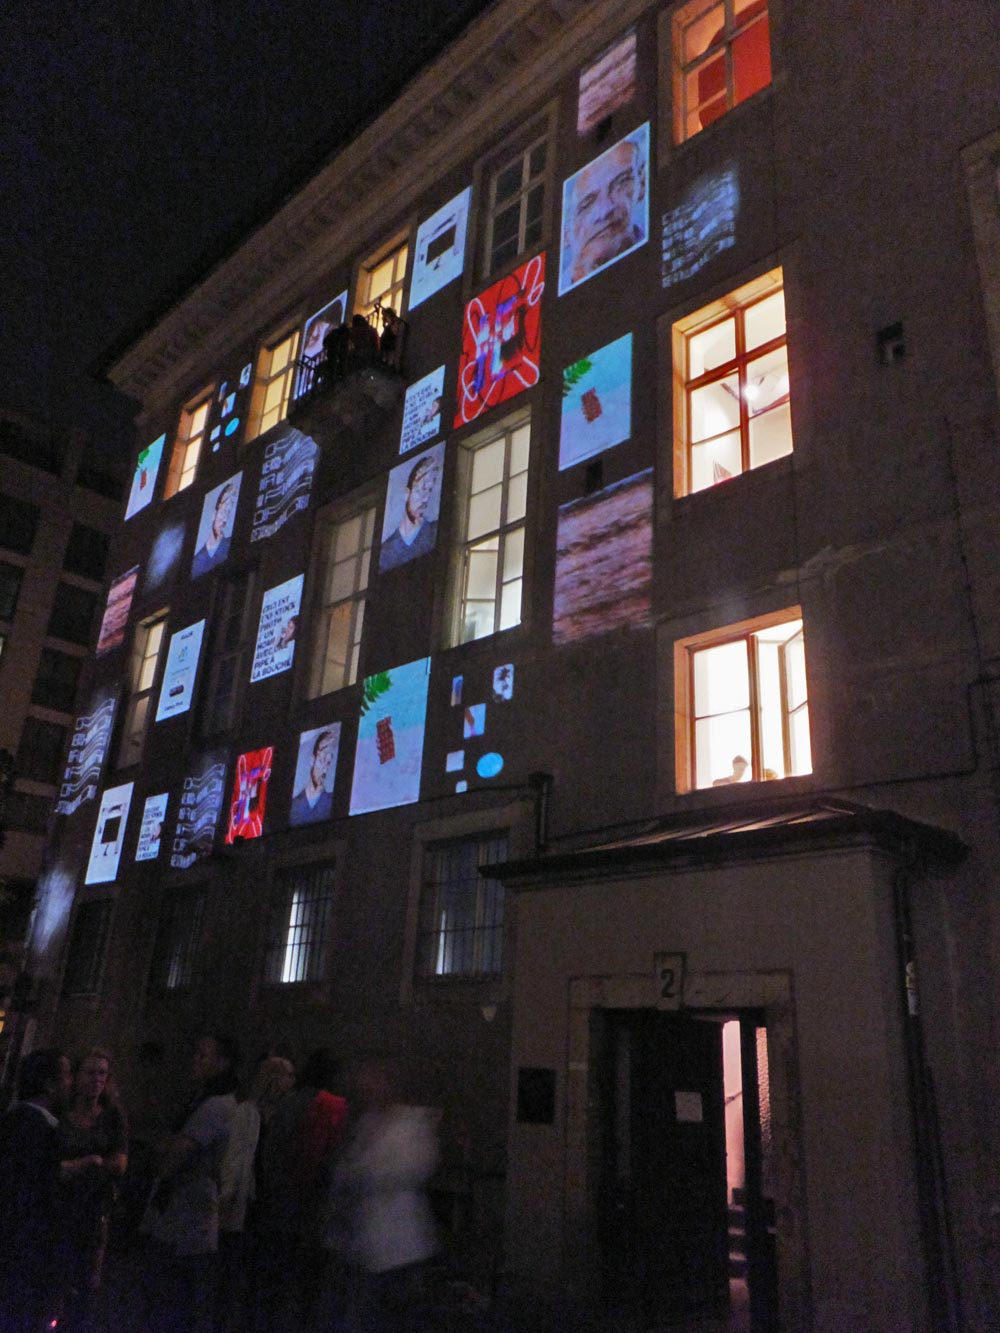 Analog Mensch Digital—Design an der Schnittstelle, Eröffnung, 5. SeptembeAnalog Mensch Digital—Design an der Schnittstelle, Eröffnung, 5. September 2014r 2014